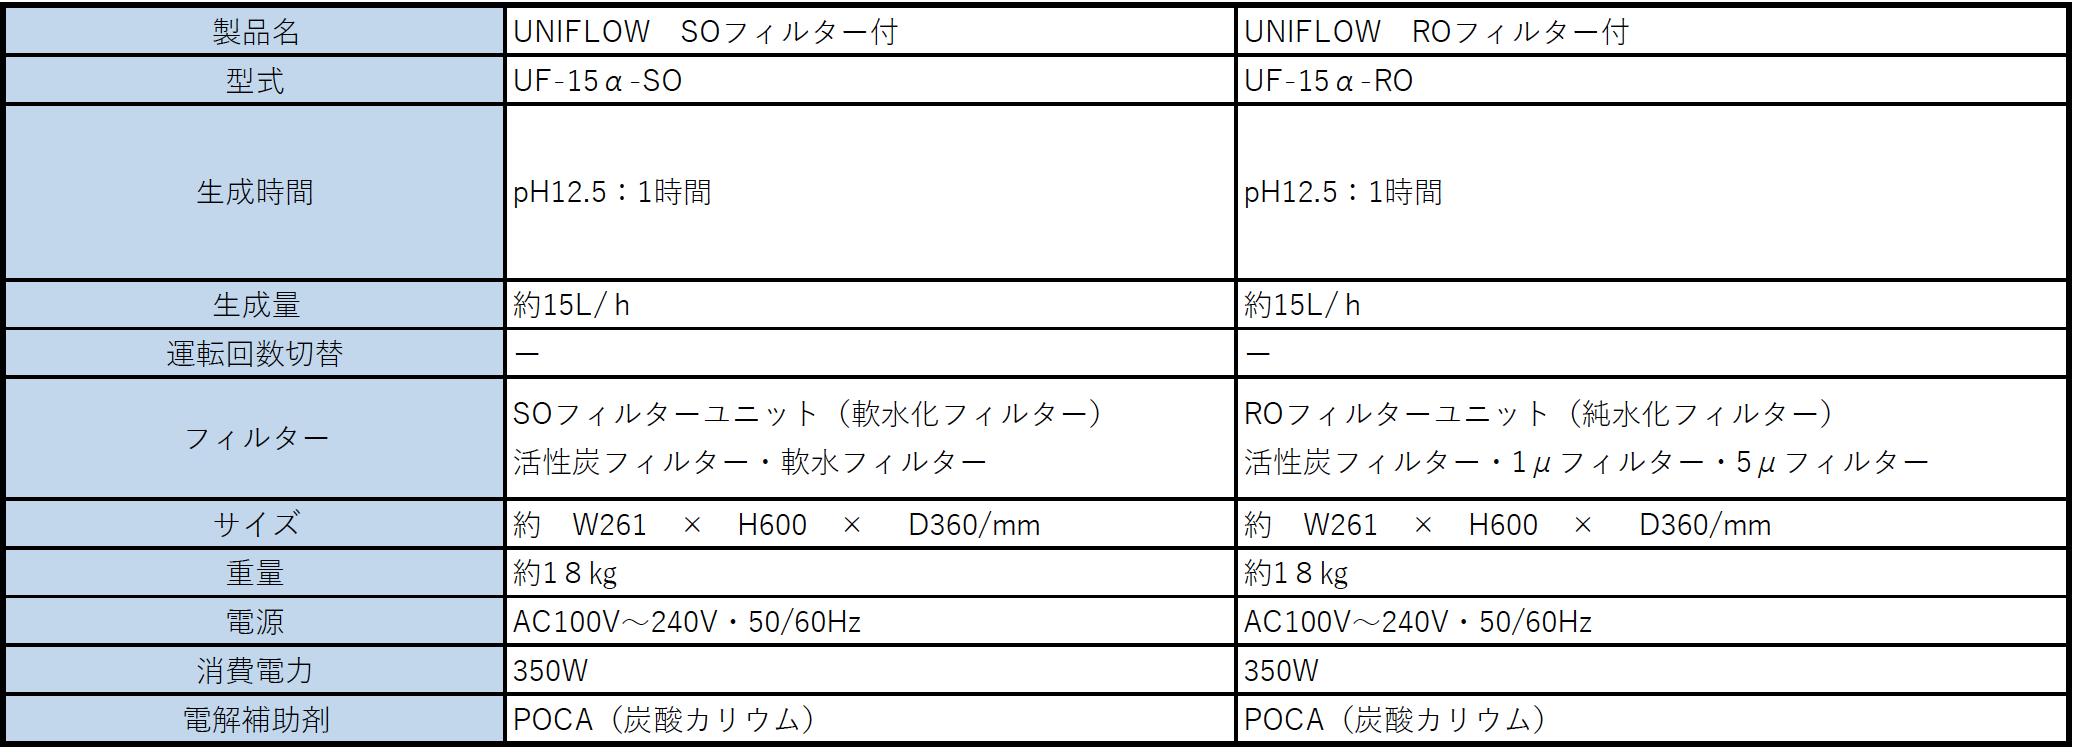 uniflow仕様1